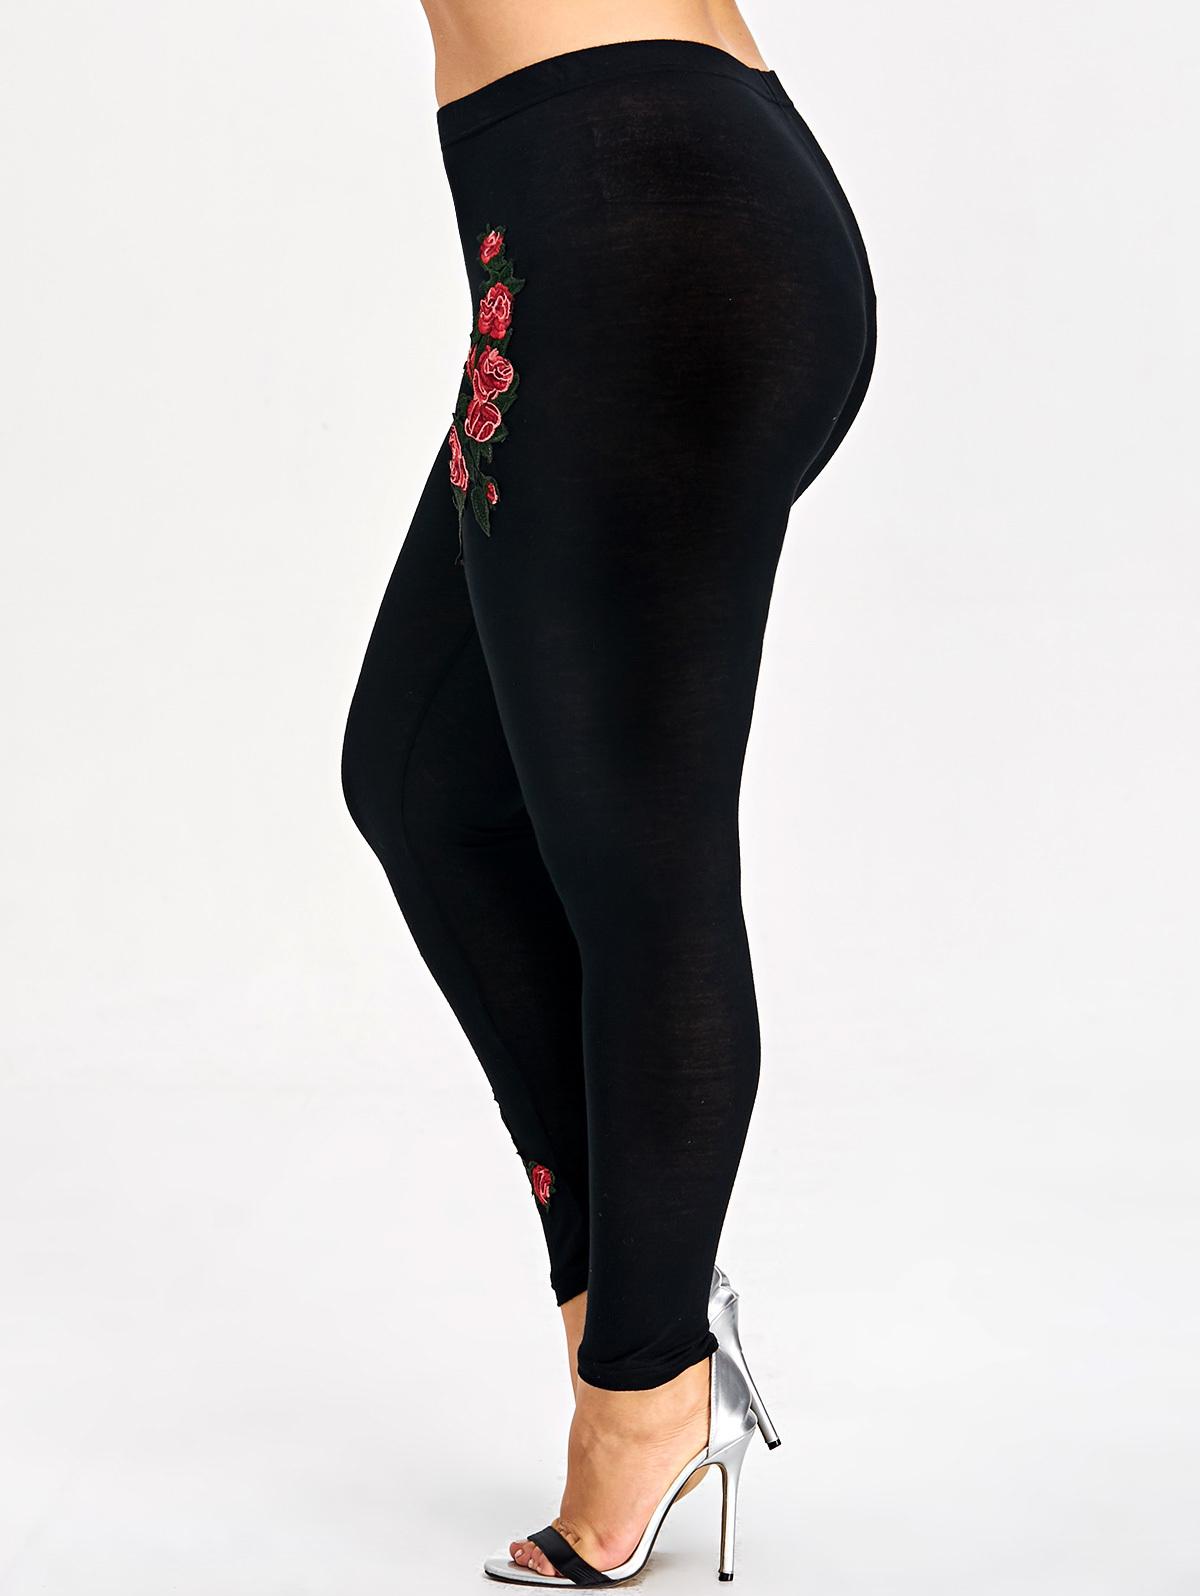 Rosegal Plus Size Embroidery Floral Leggings Women Pants Leggins Skinny Elastic Fitness Jeggings Pencil Pants Ladies Trousers